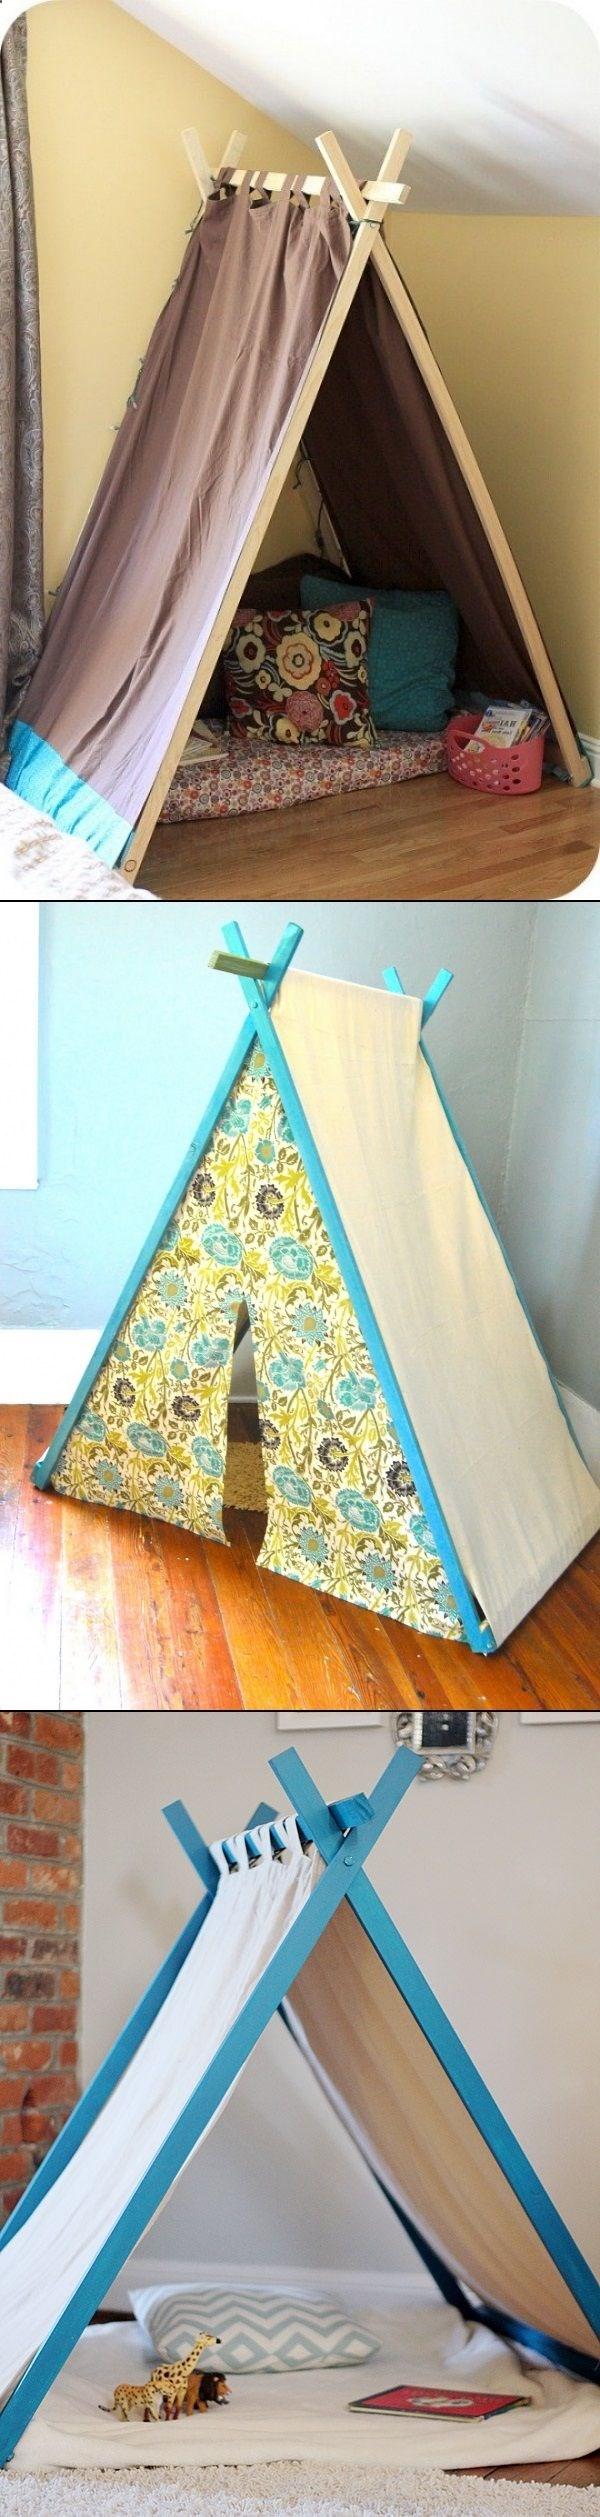 DIY Play Tent For Kids     HomeDecorating  Crafts Ideas   Pinterest ... 6b35181b7407